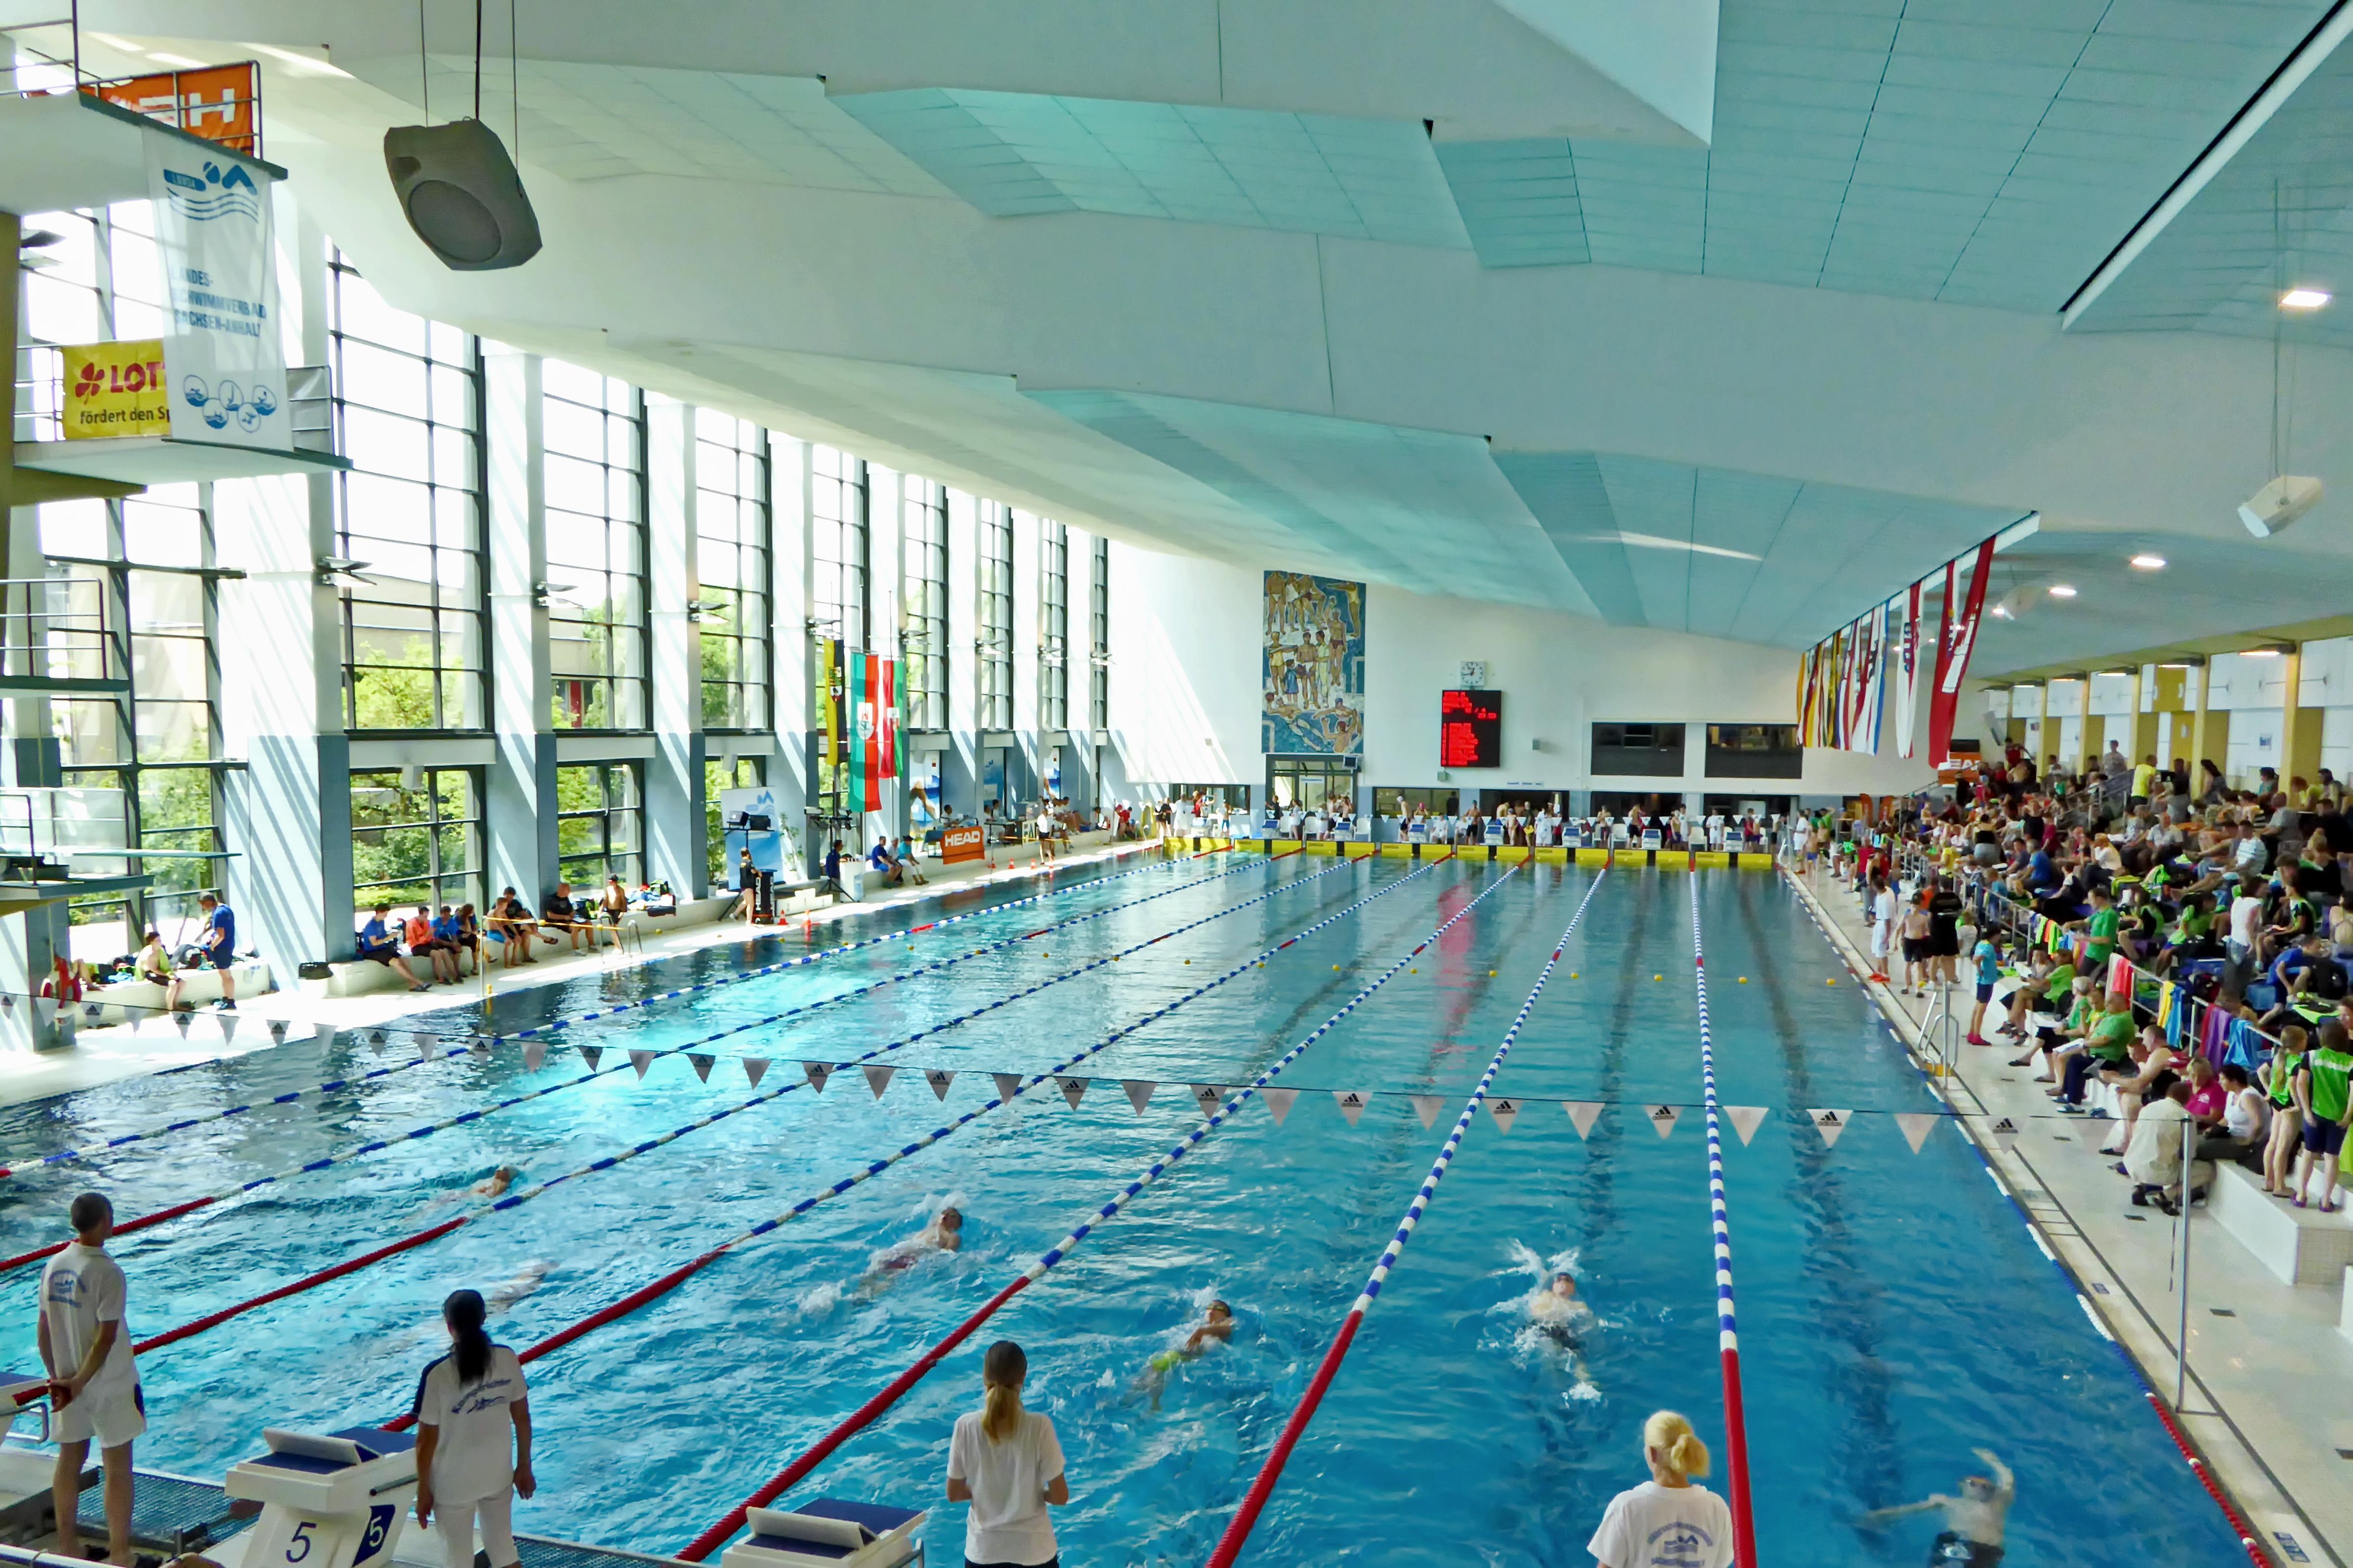 Sfondi nuoto interno magdeburg baden elba - Piscina al coperto milano ...